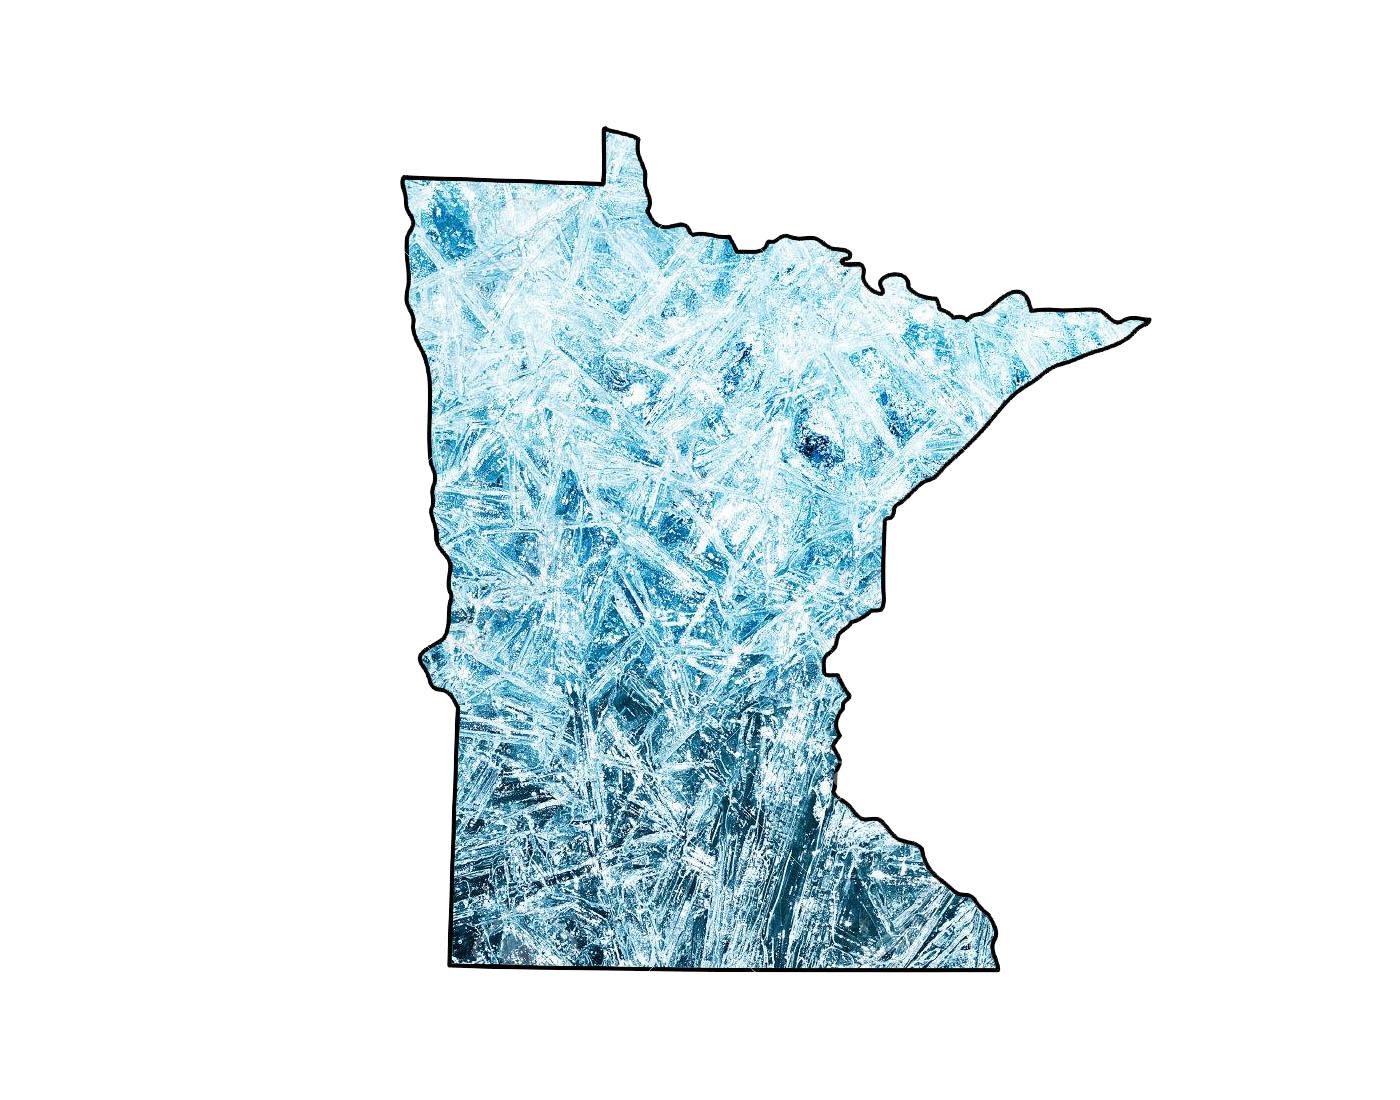 Minnesota in a frozen tundra